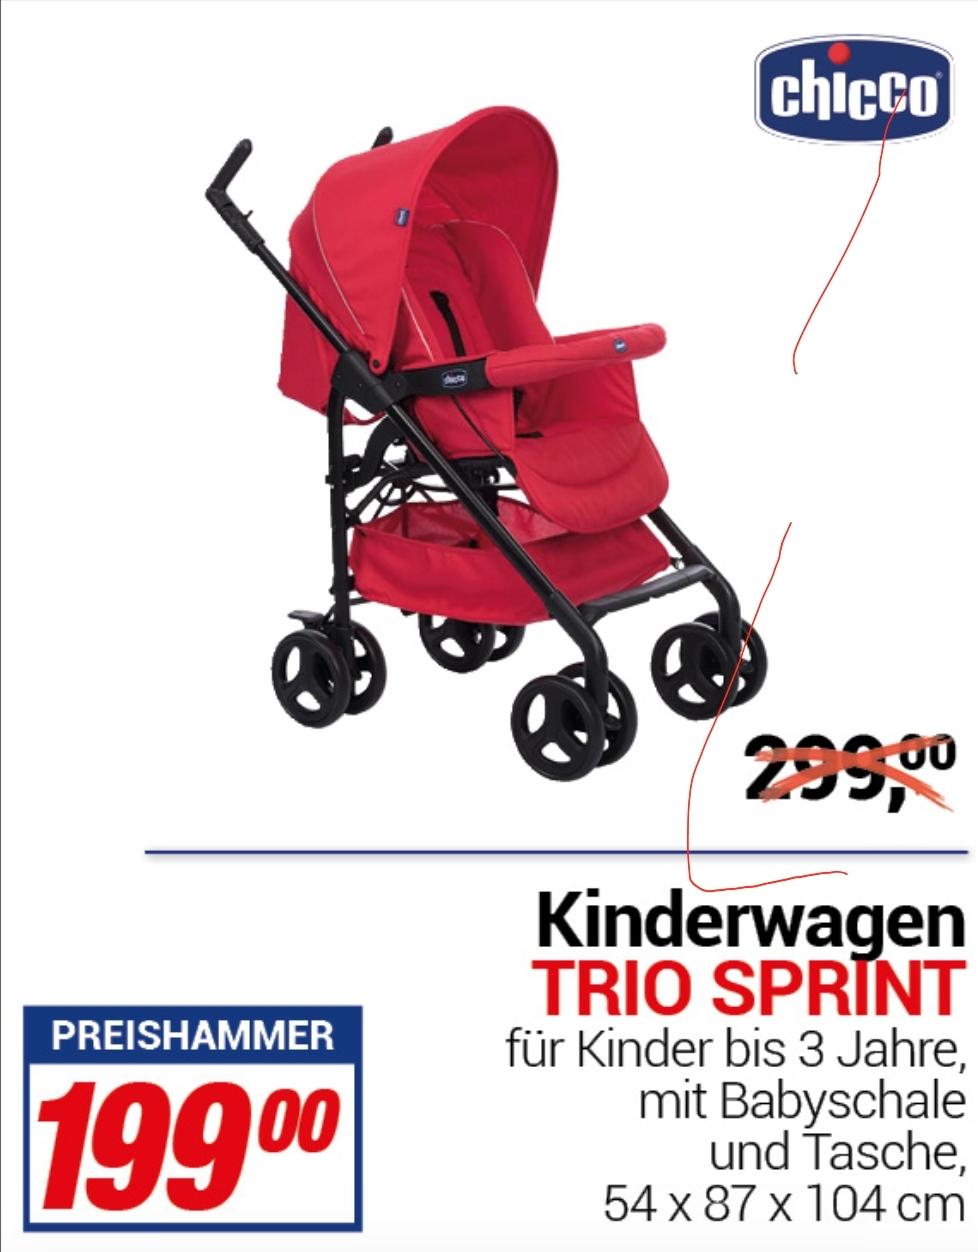 [ Centershop ] Chicco Kinderwagen Trio Sprint